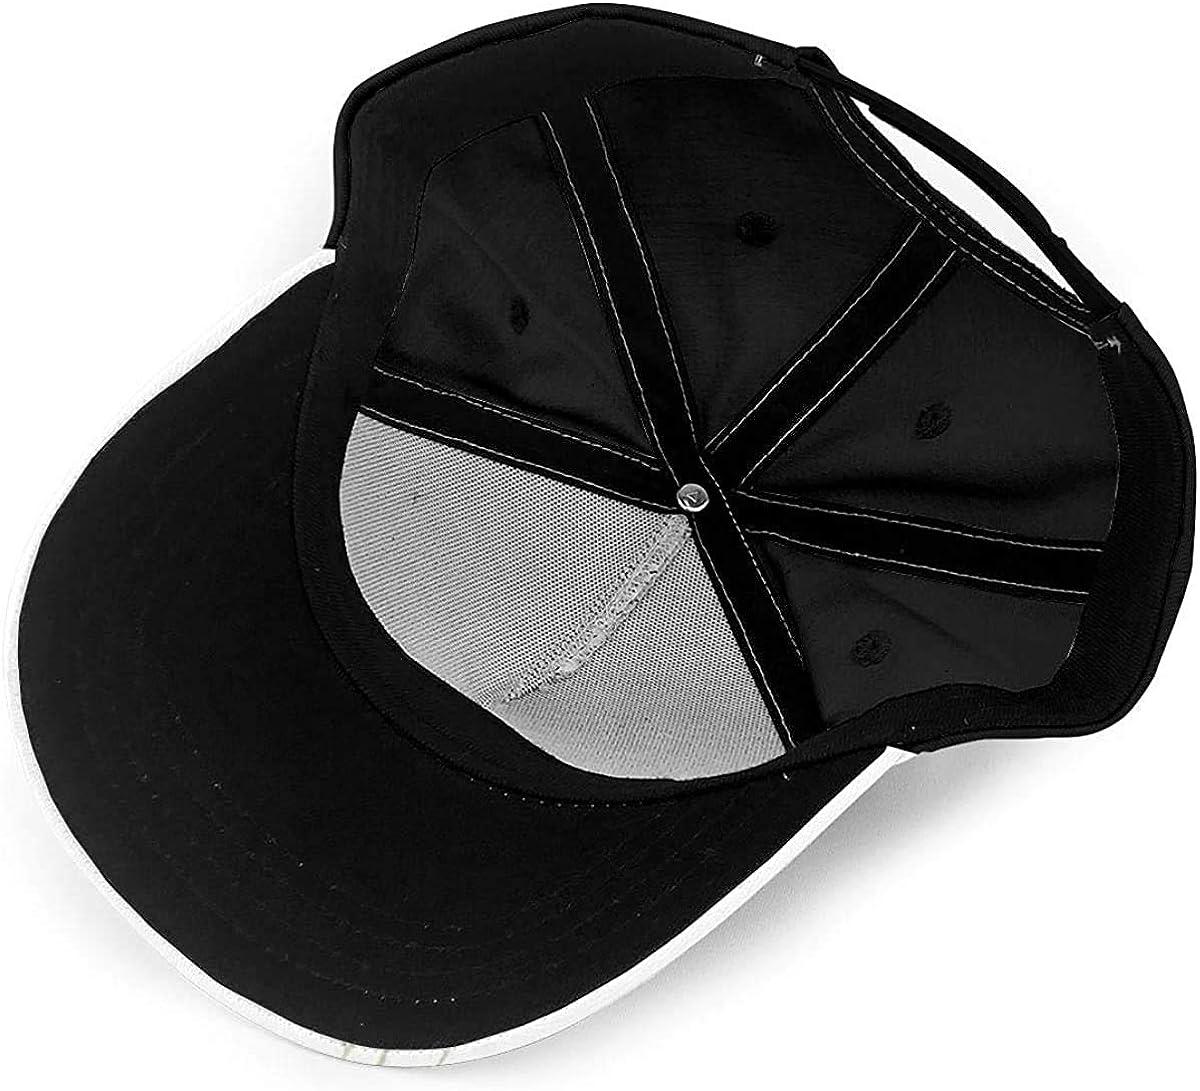 Art Draw Hummingbirds Arround The Flower Lightweight Unisex Baseball Caps Adjustable Breathable Sun Hat for Sport Outdoor Black